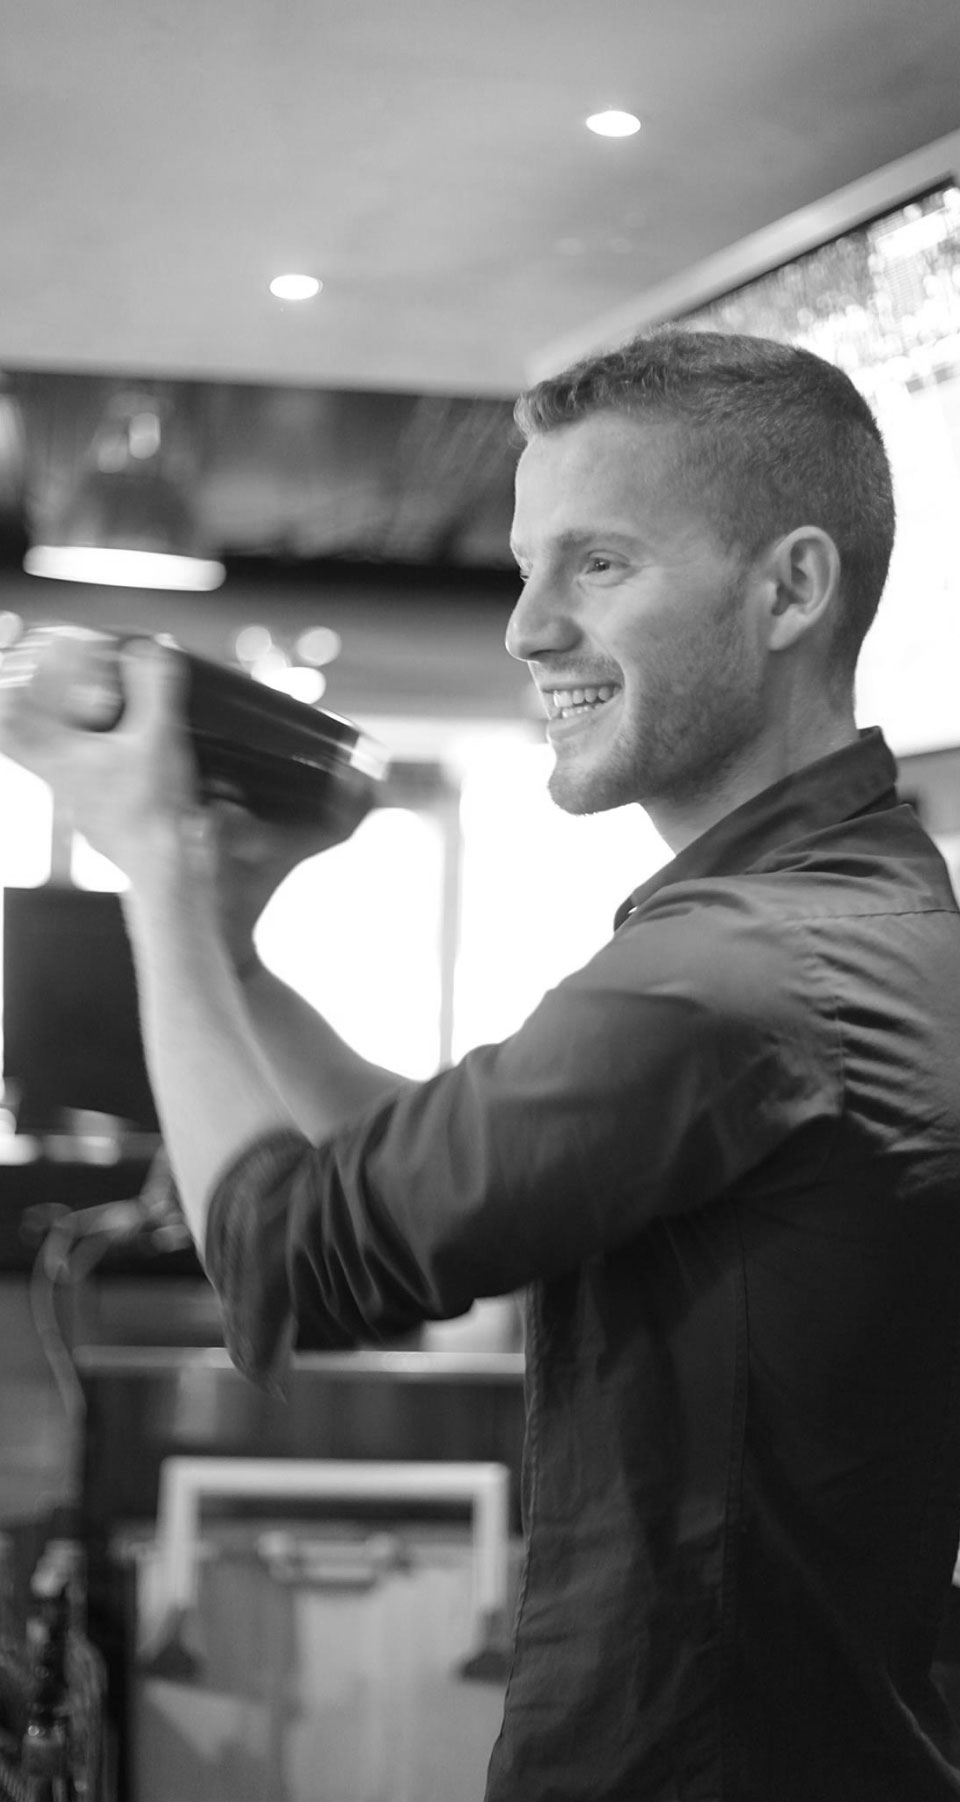 bar tender making a cocktail